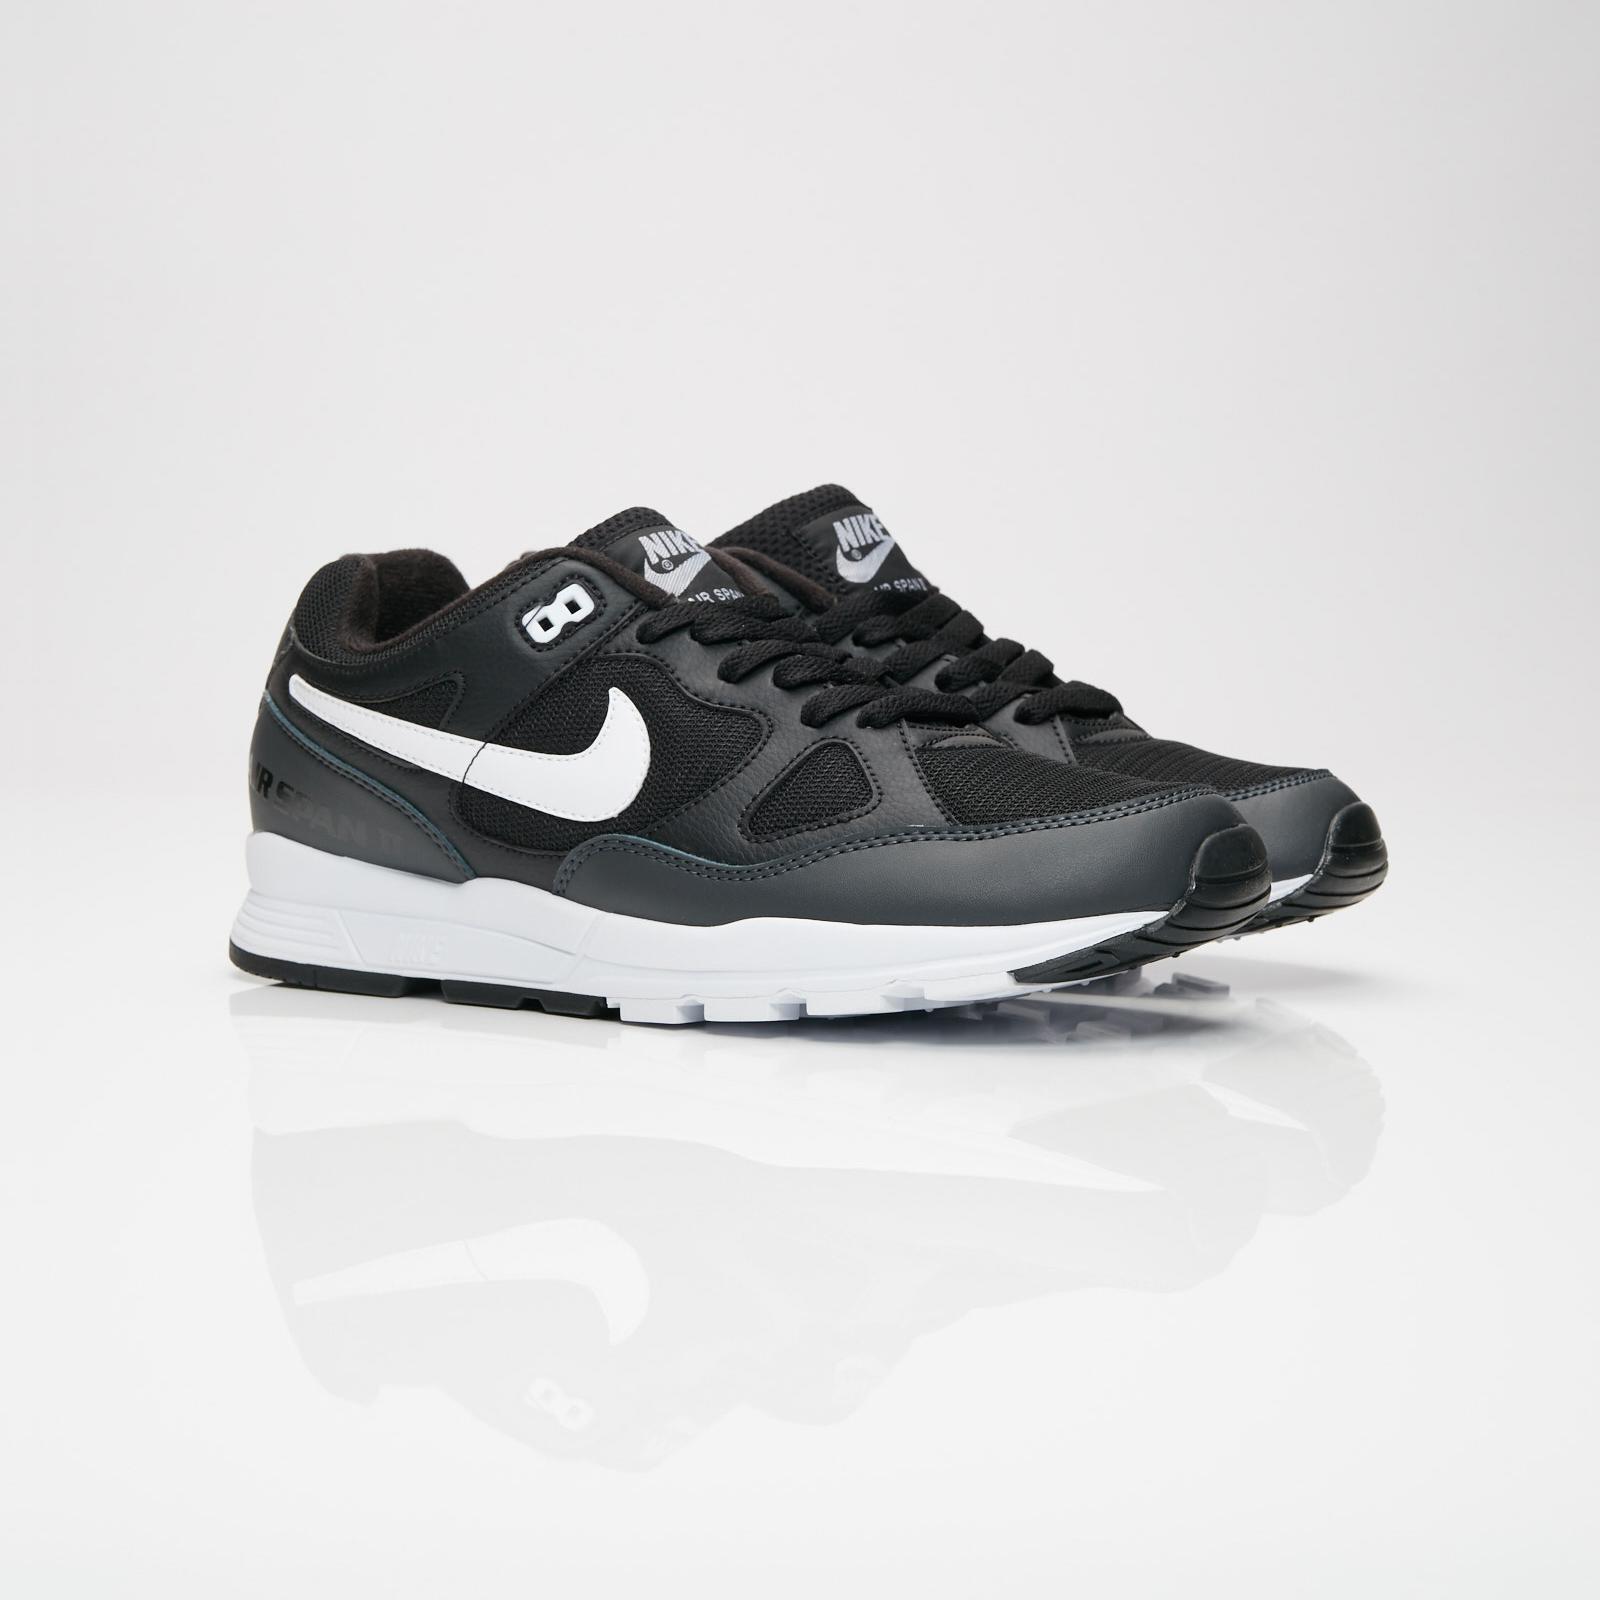 best service f33f0 6c4b0 Nike Sportswear Air Span II